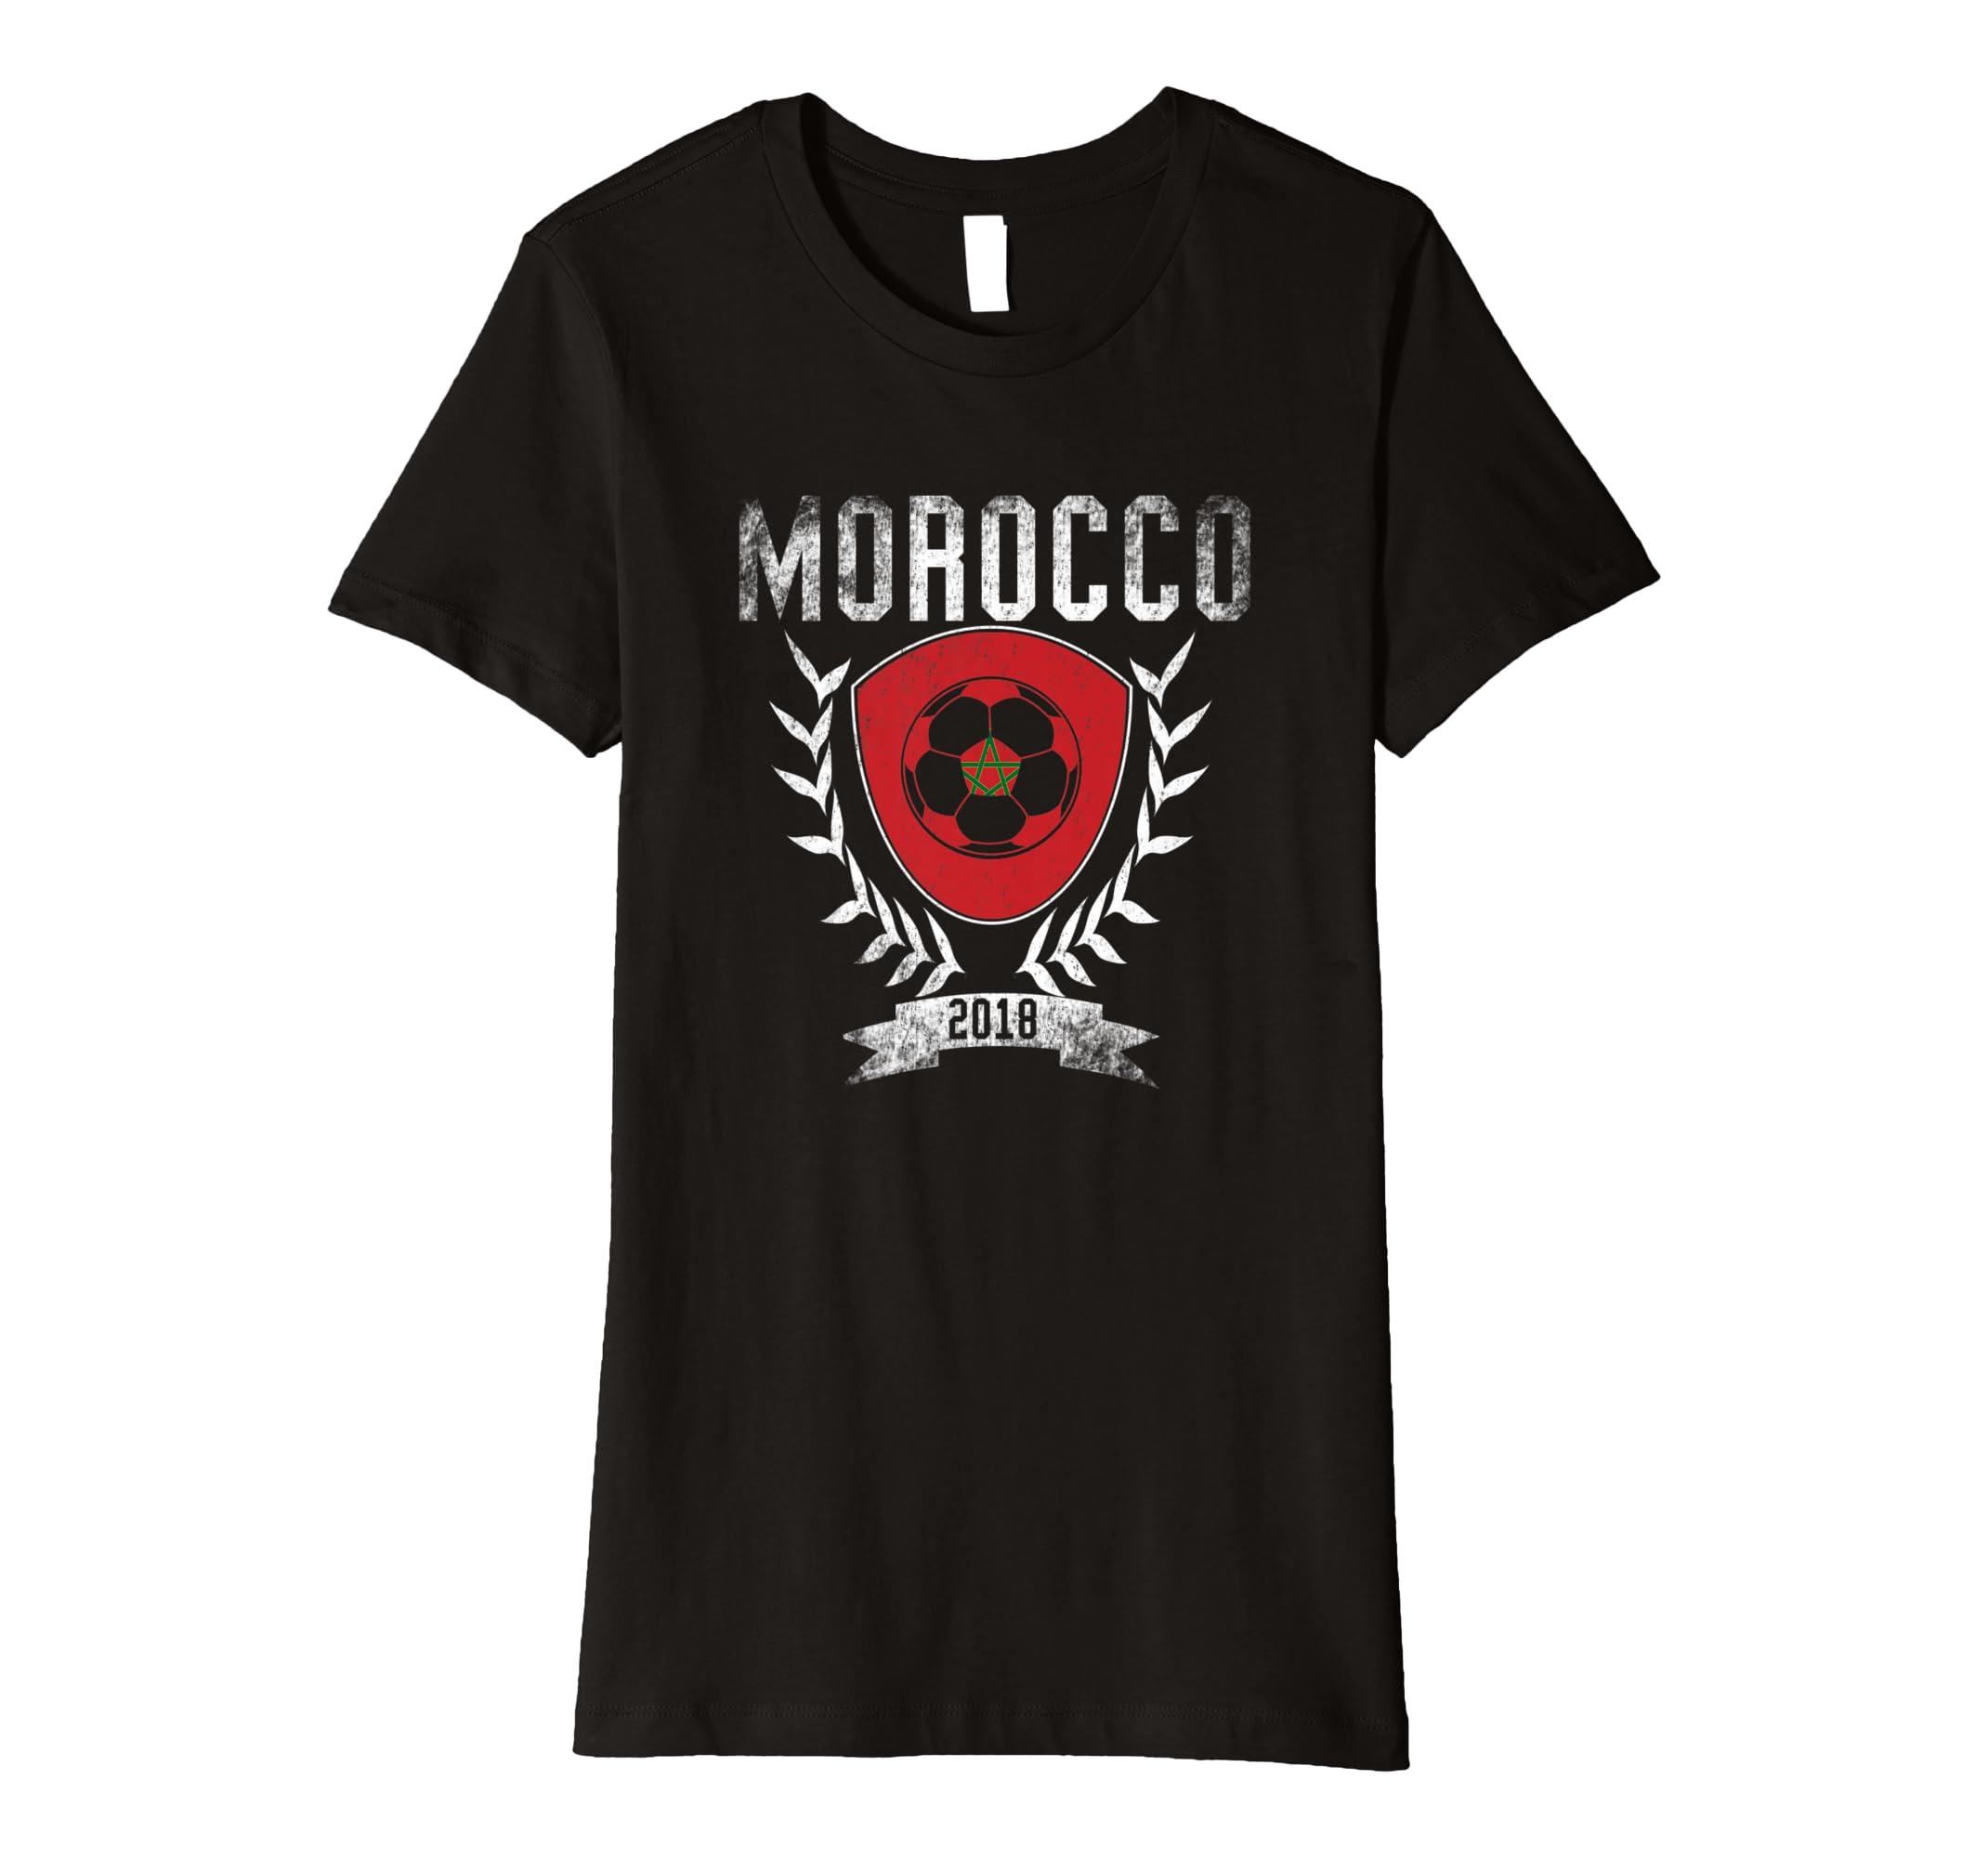 2b936e25567 Amazon.com: Moroccan Football Cup 2018 T-Shirt - Morocco Soccer Jersey:  Clothing